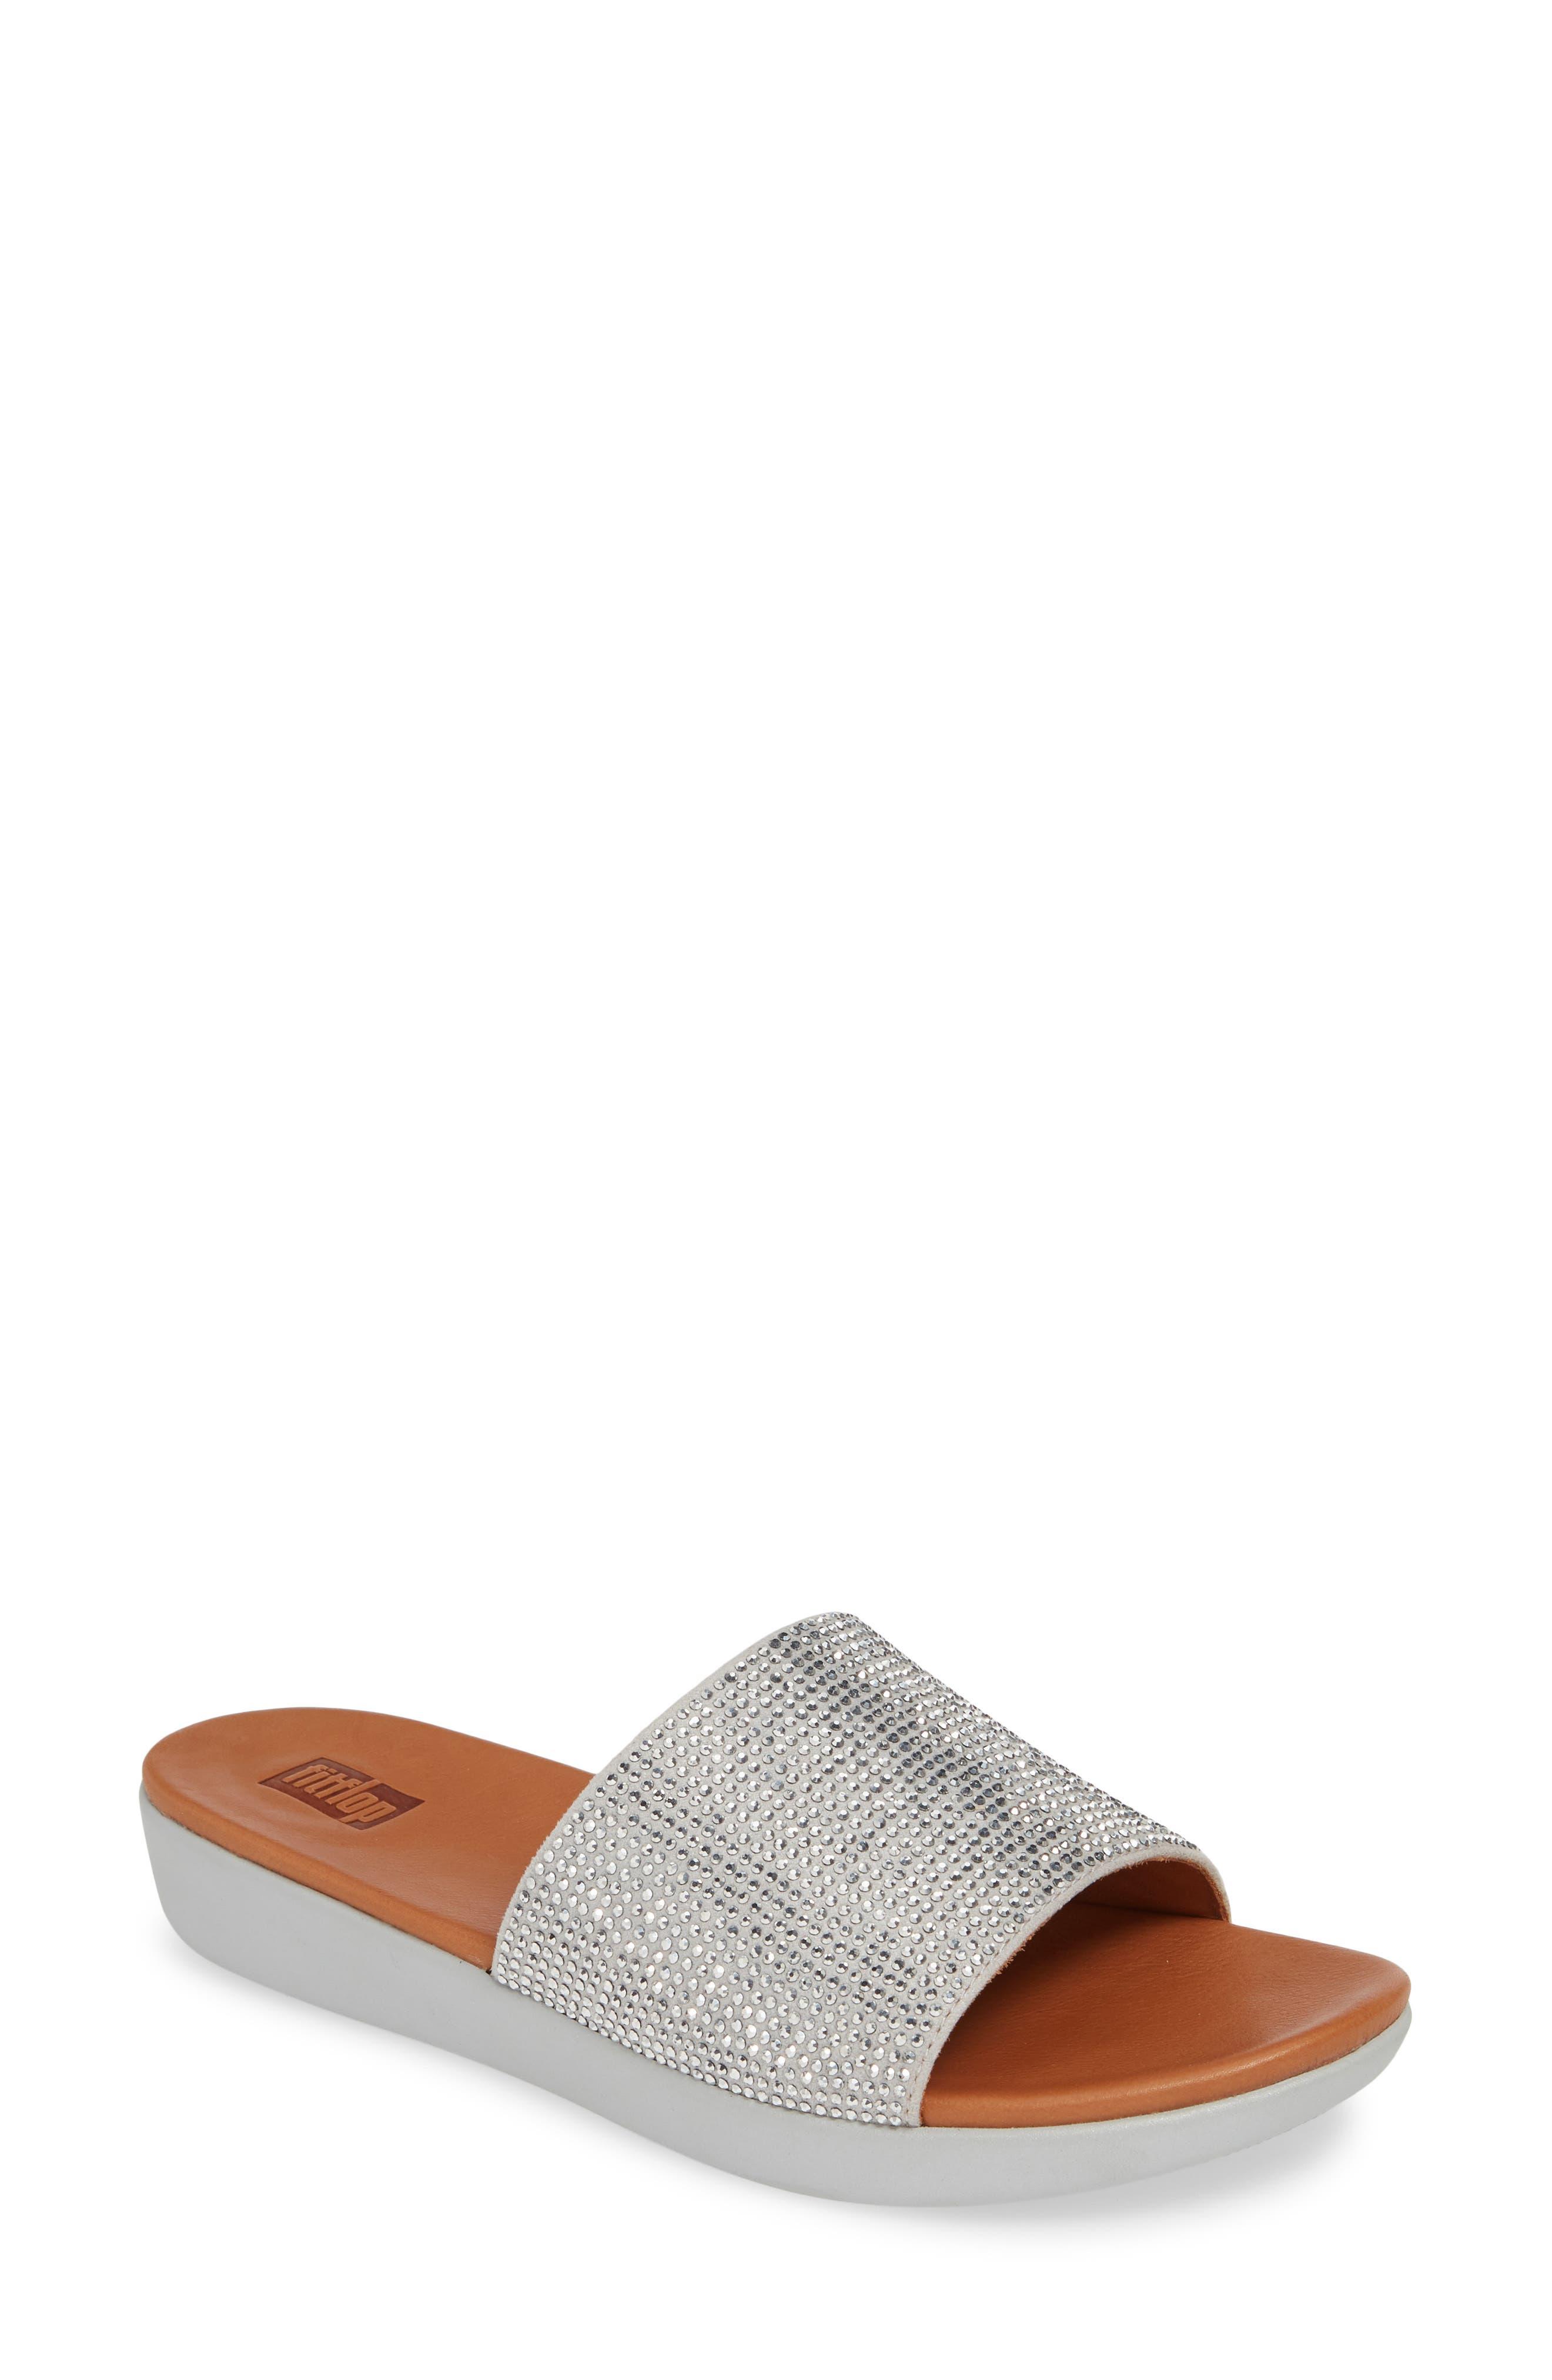 Fitflop Sola Crystalled Slide Sandal, Metallic